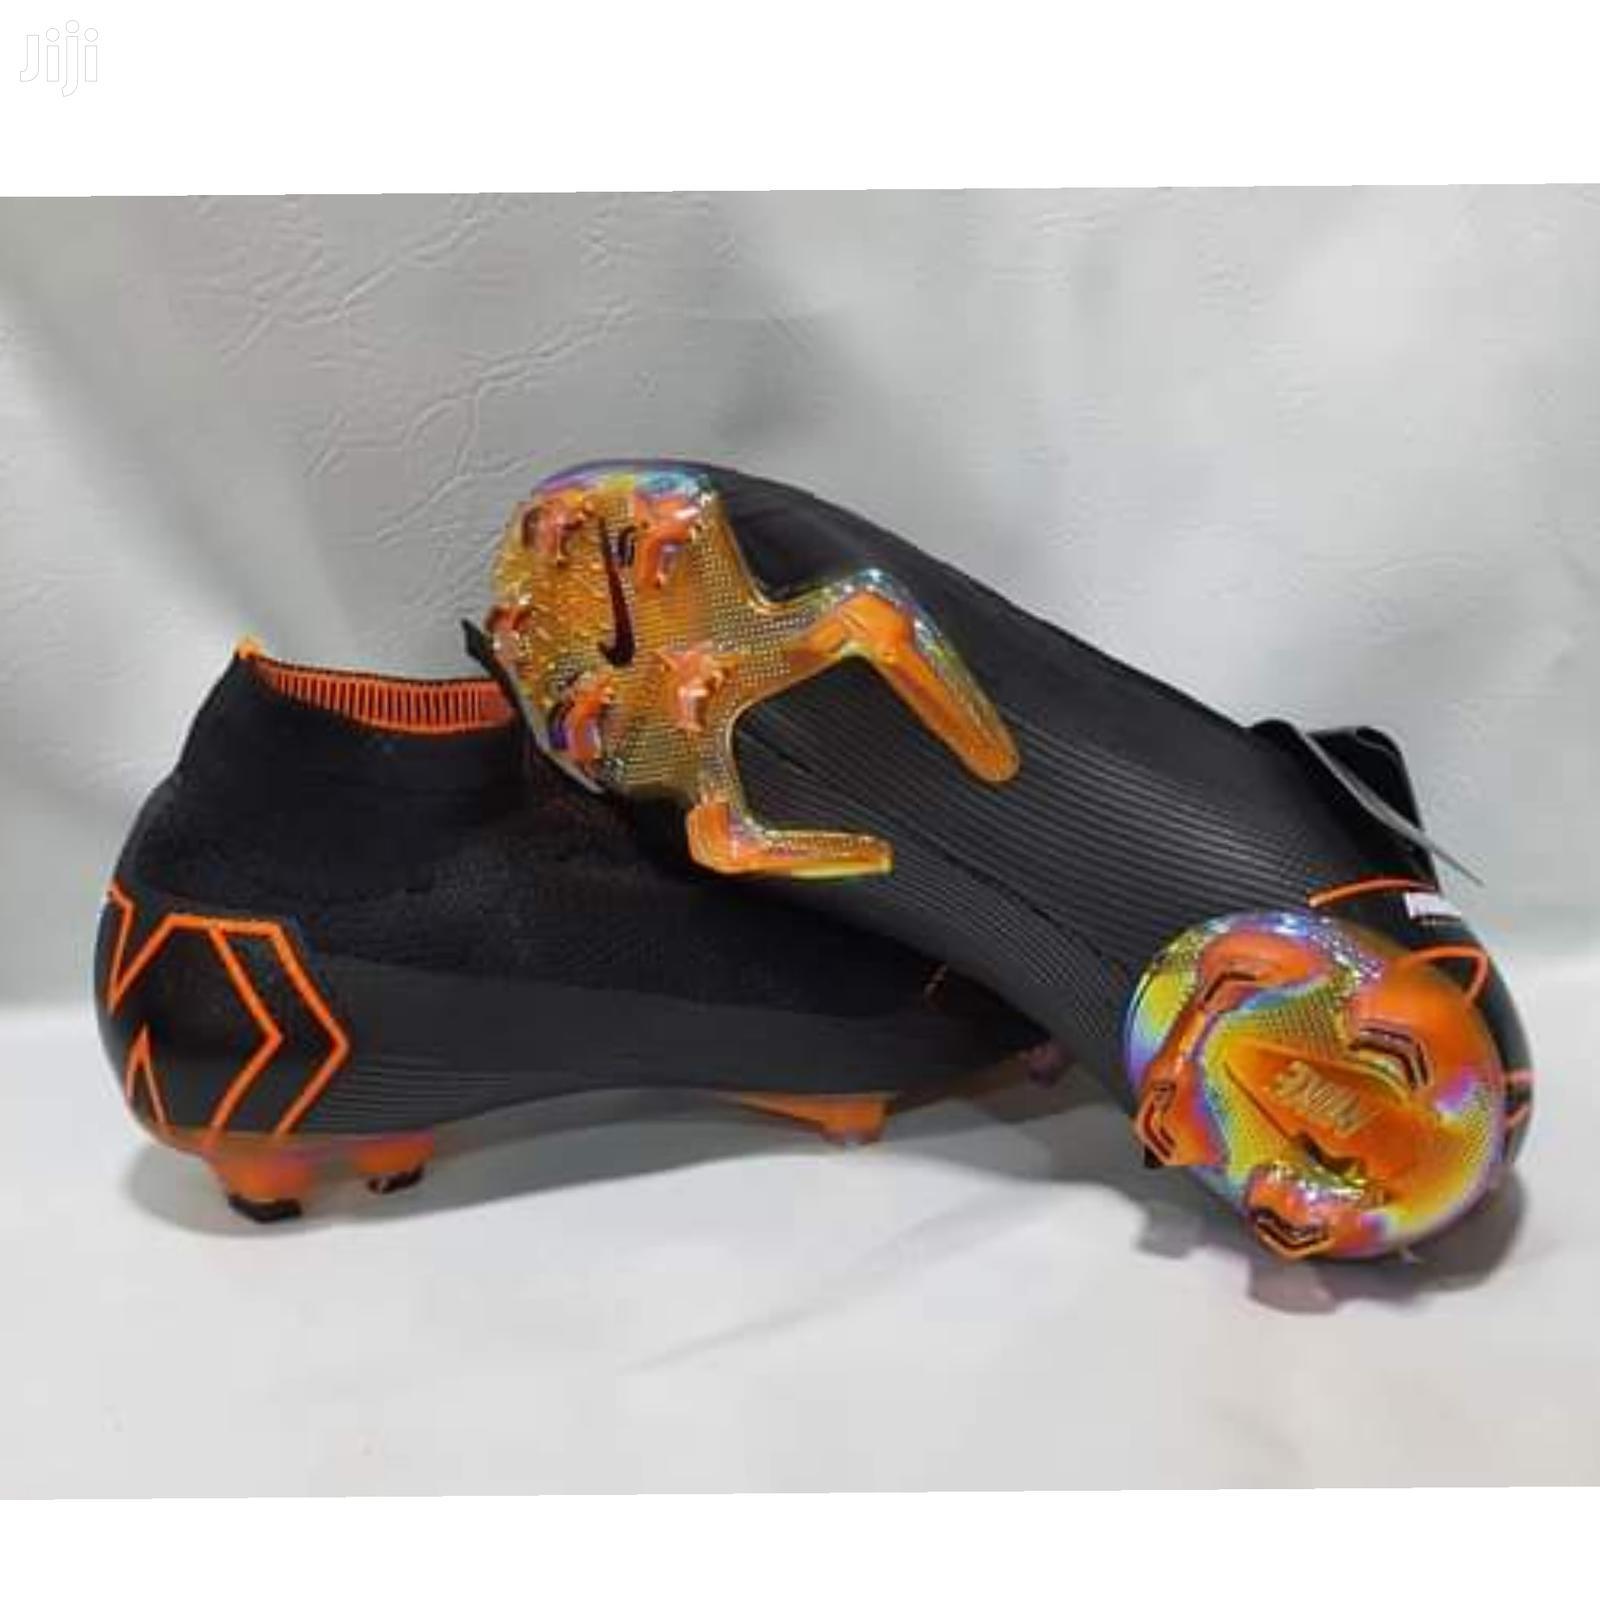 Football Boots NK2020